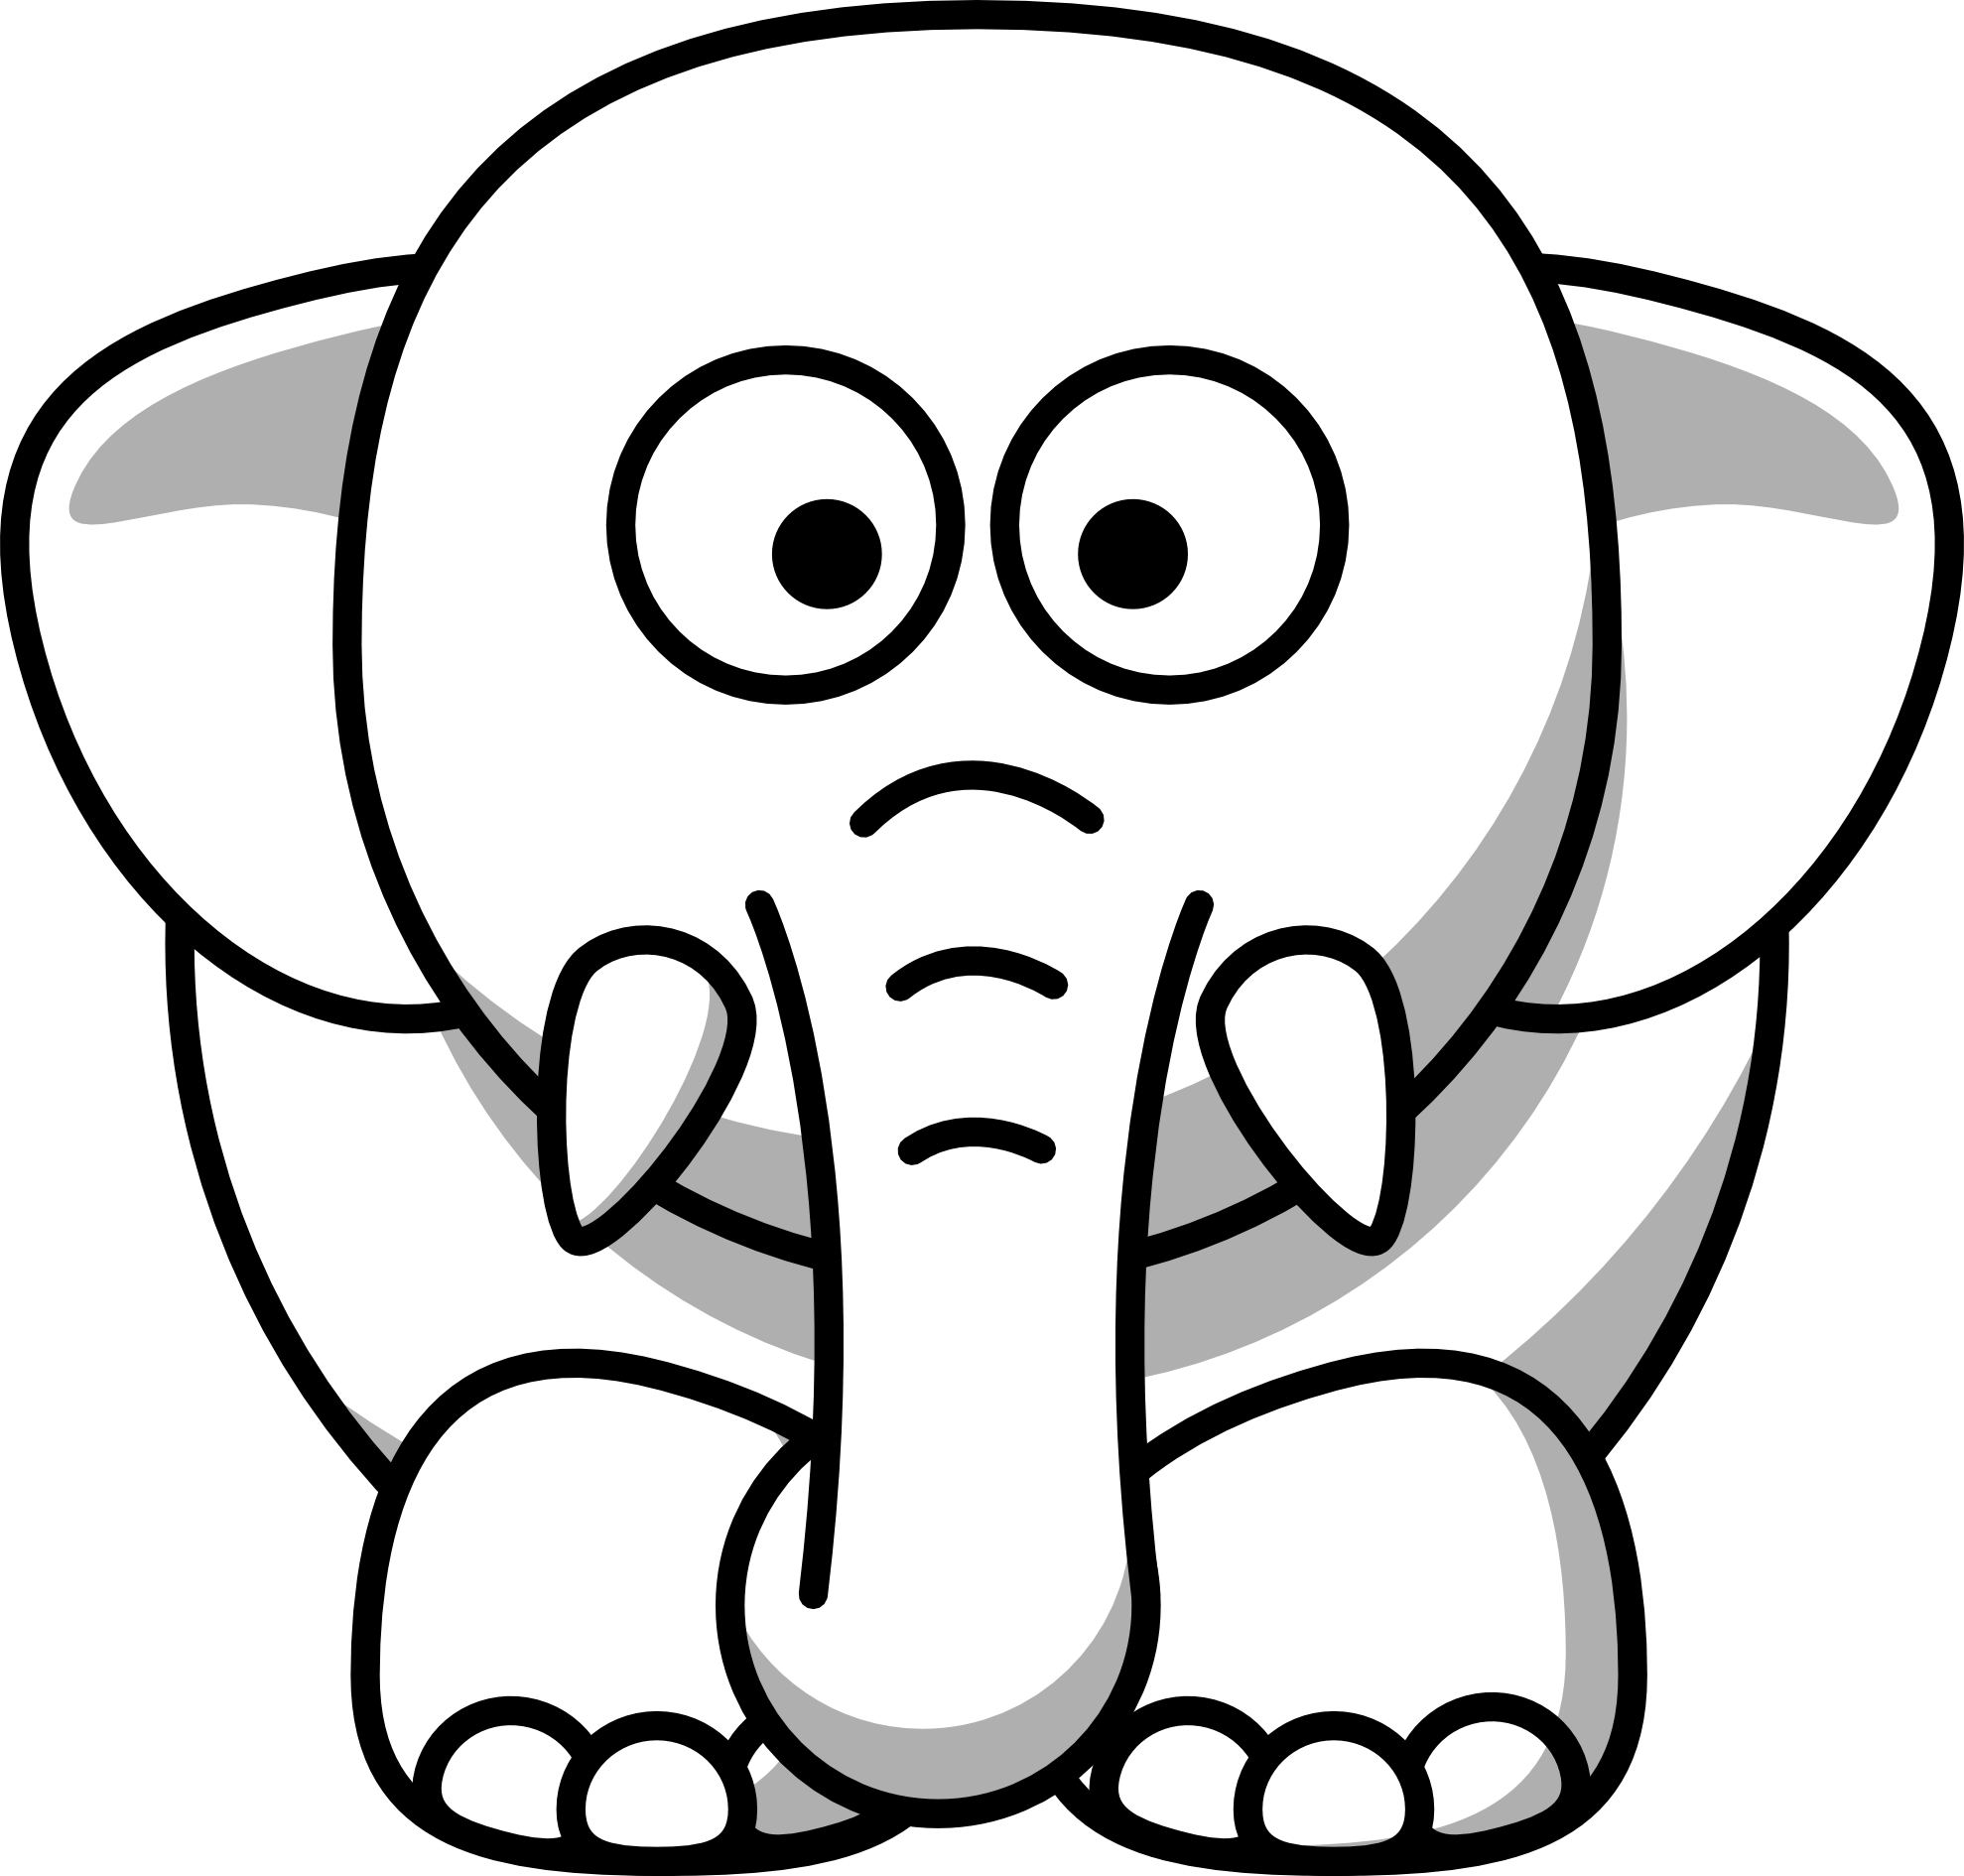 Animal Clip Art White Line Art Christmas Xmas Stuffed Animal Art Christmas Clip Art Cartoon Elephant Elephant Clip Art Cute Cartoon Animals